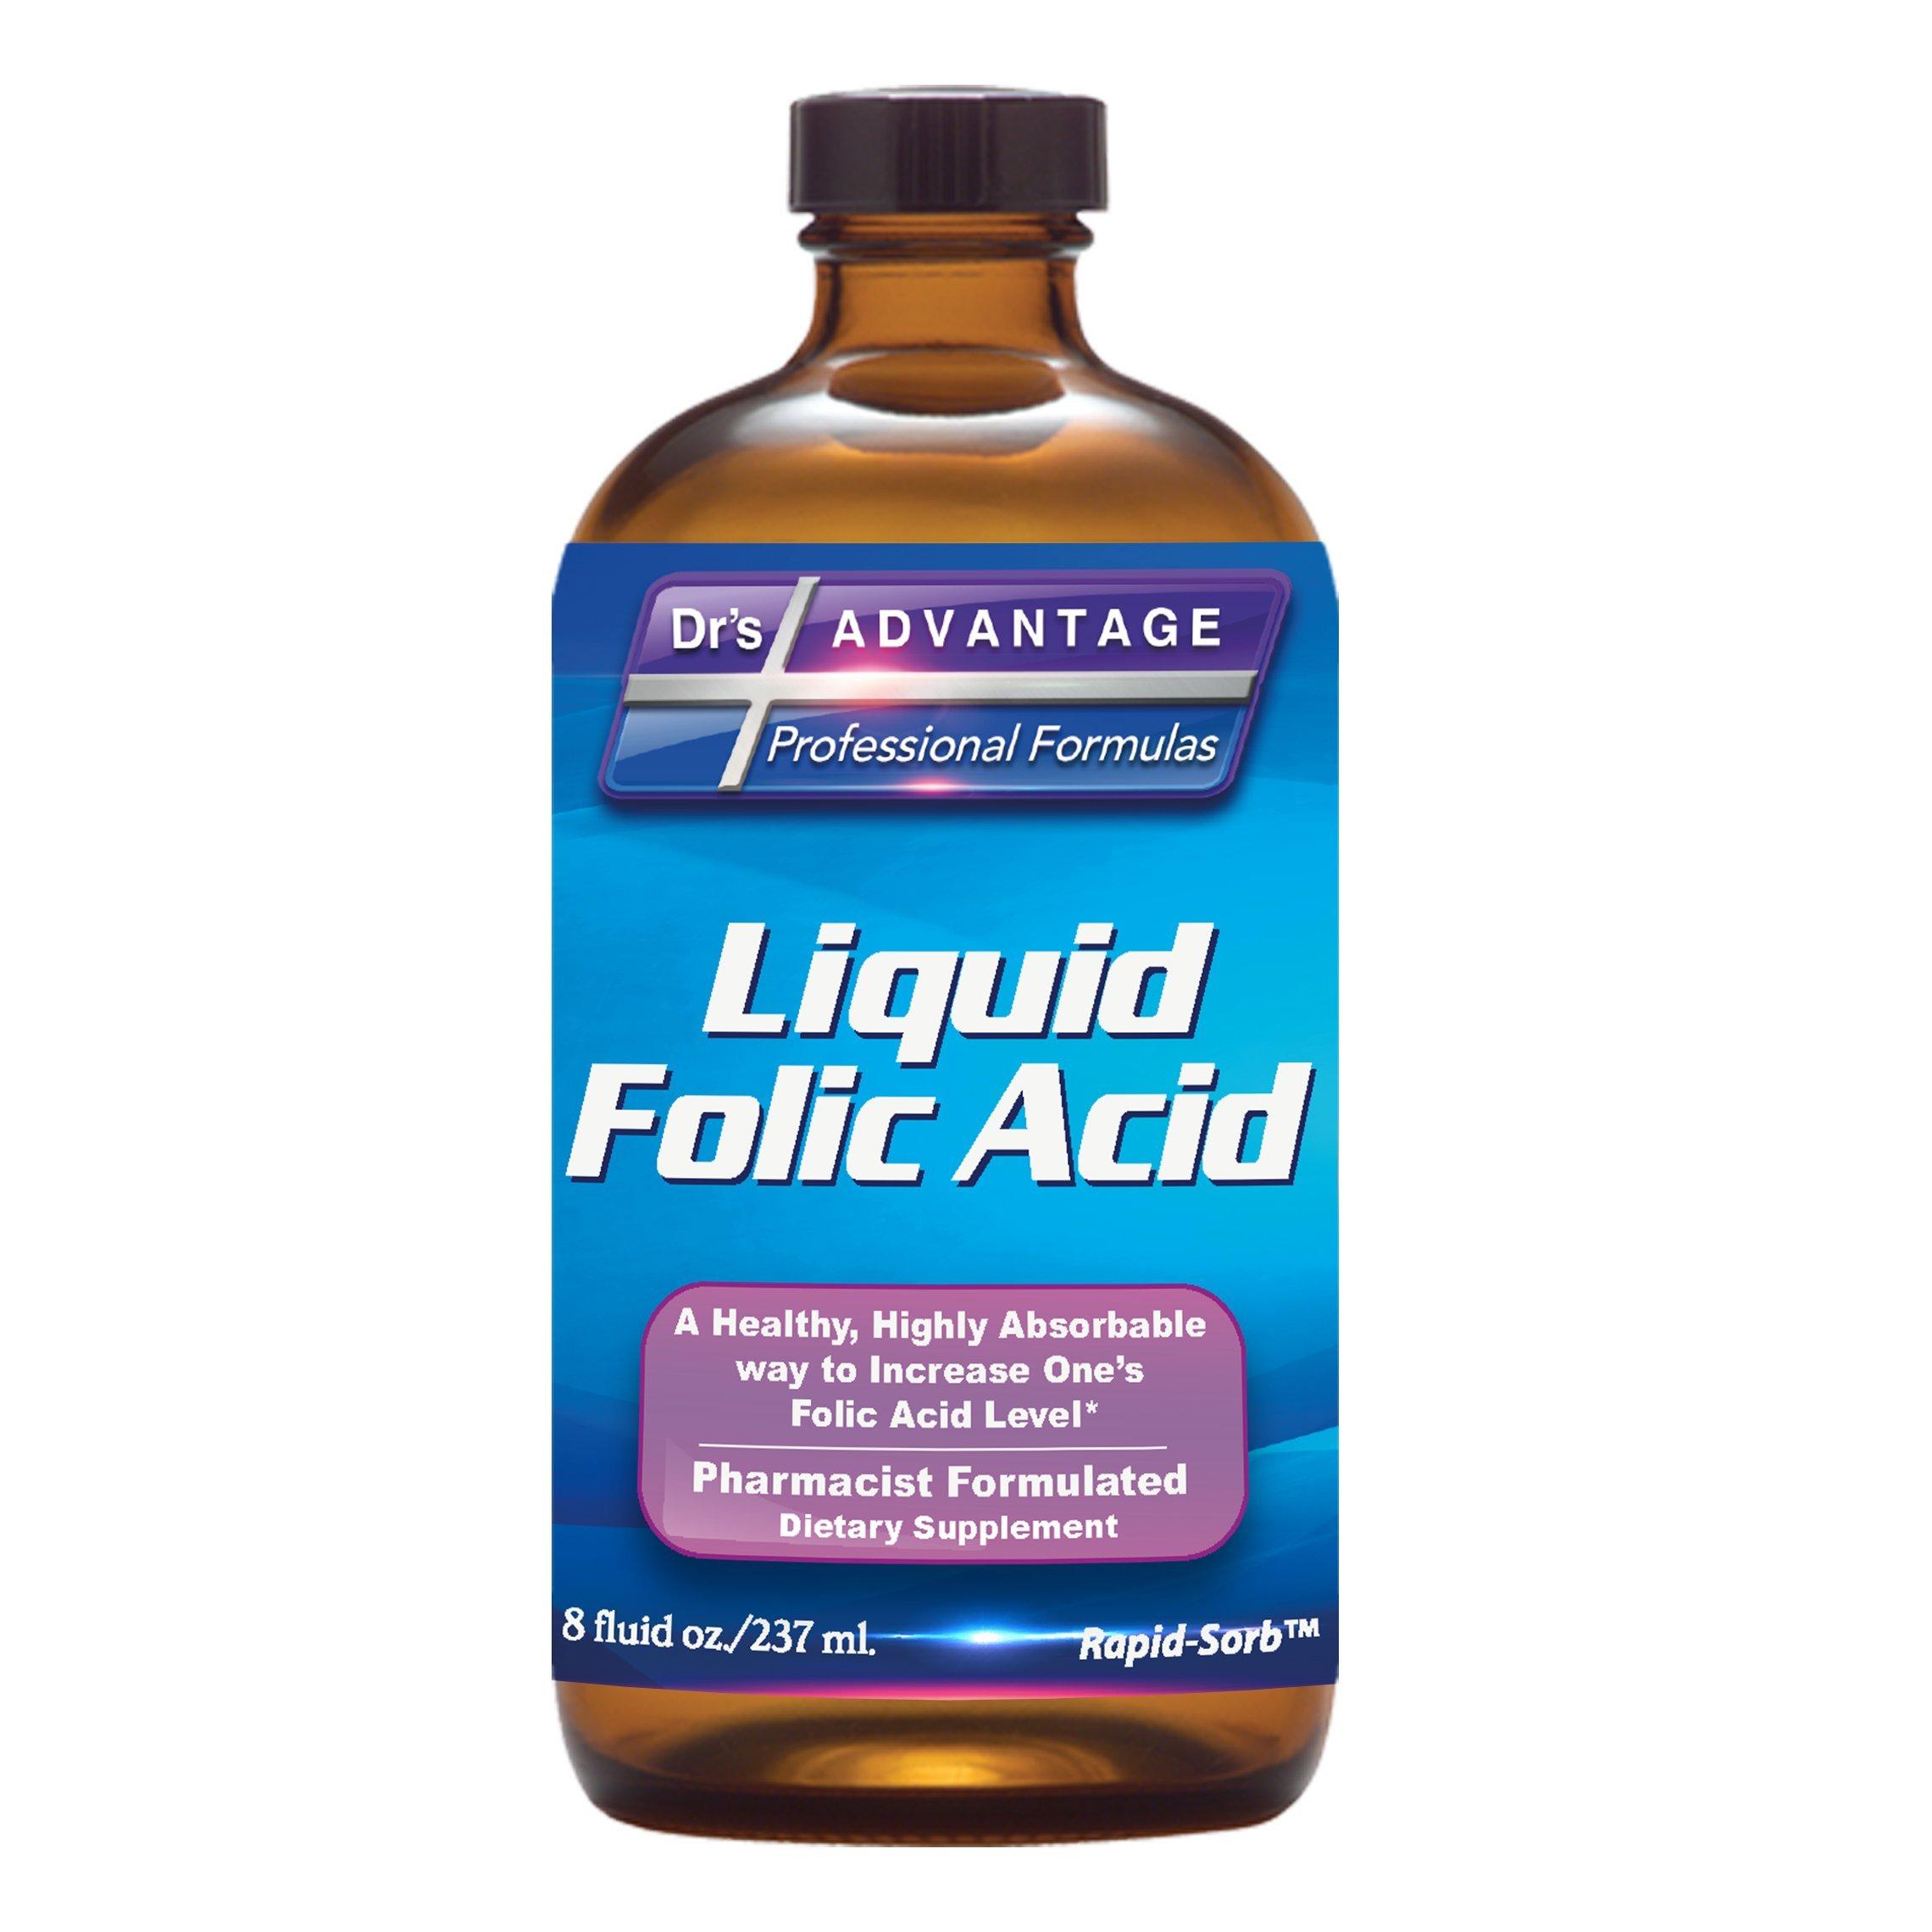 Dr's Advantage - Liquid Folic Acid 800 MCG, 8 oz. [Health & Beauty]